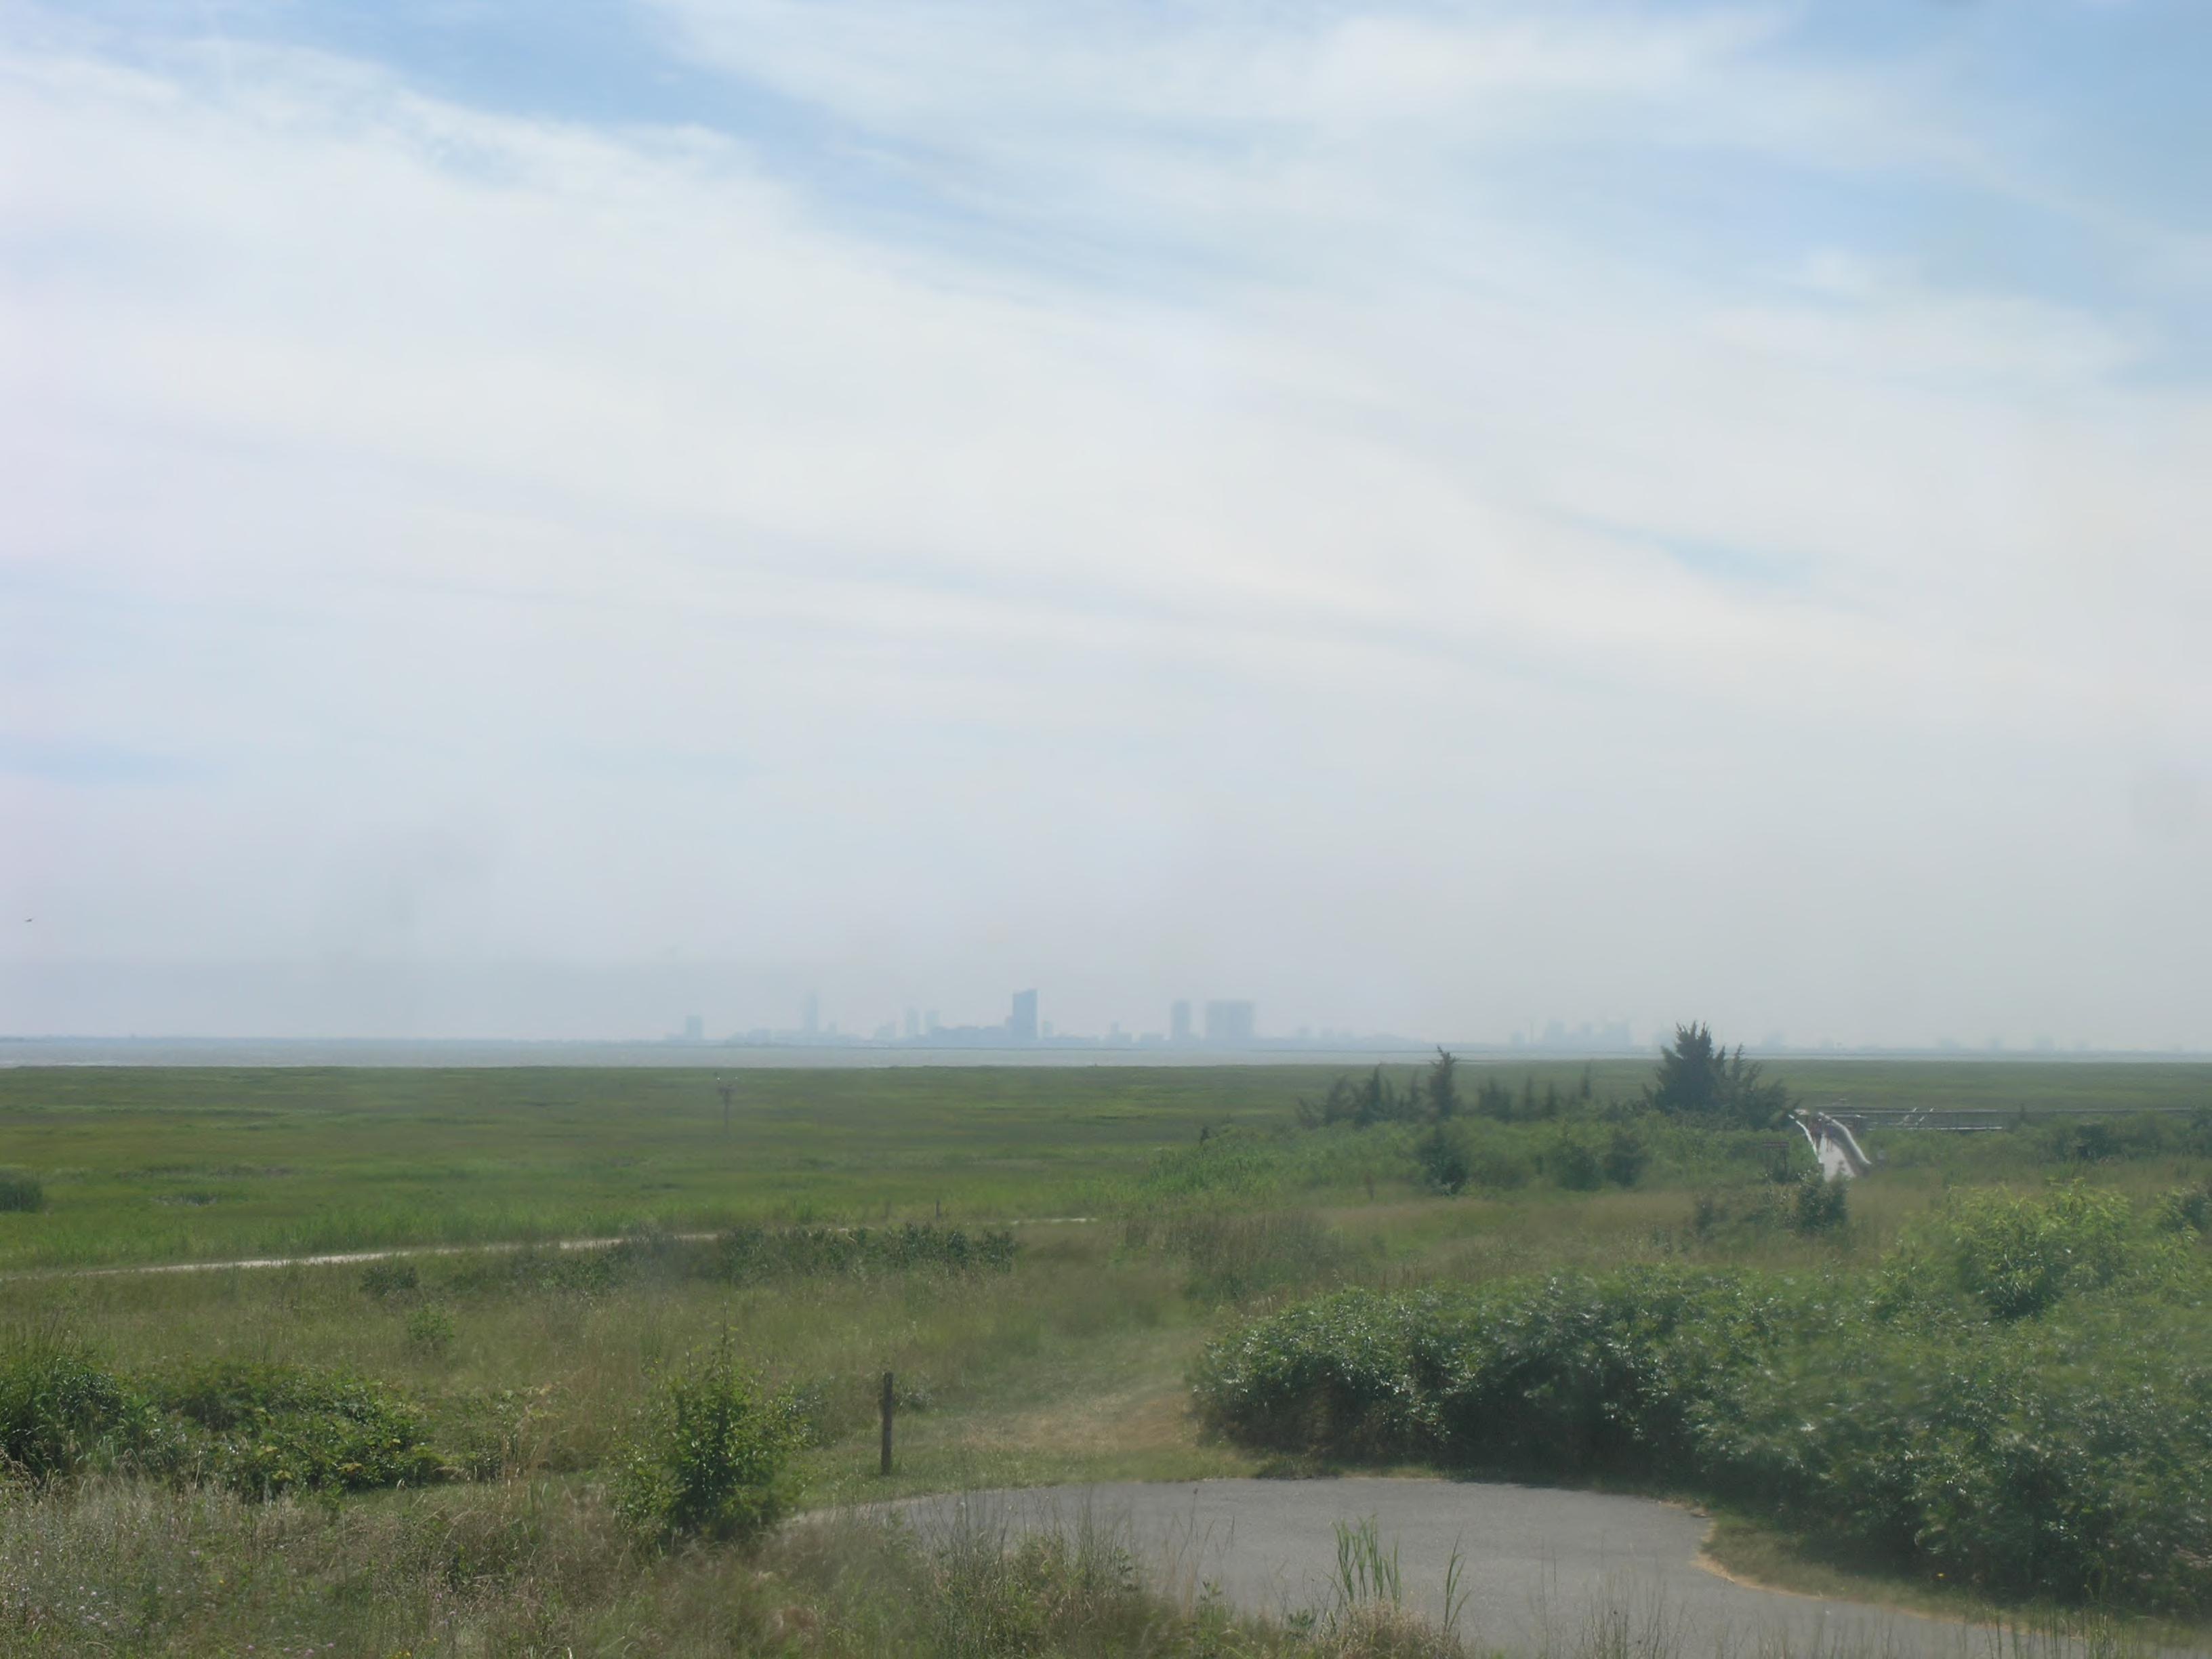 brigantine/2 webcam